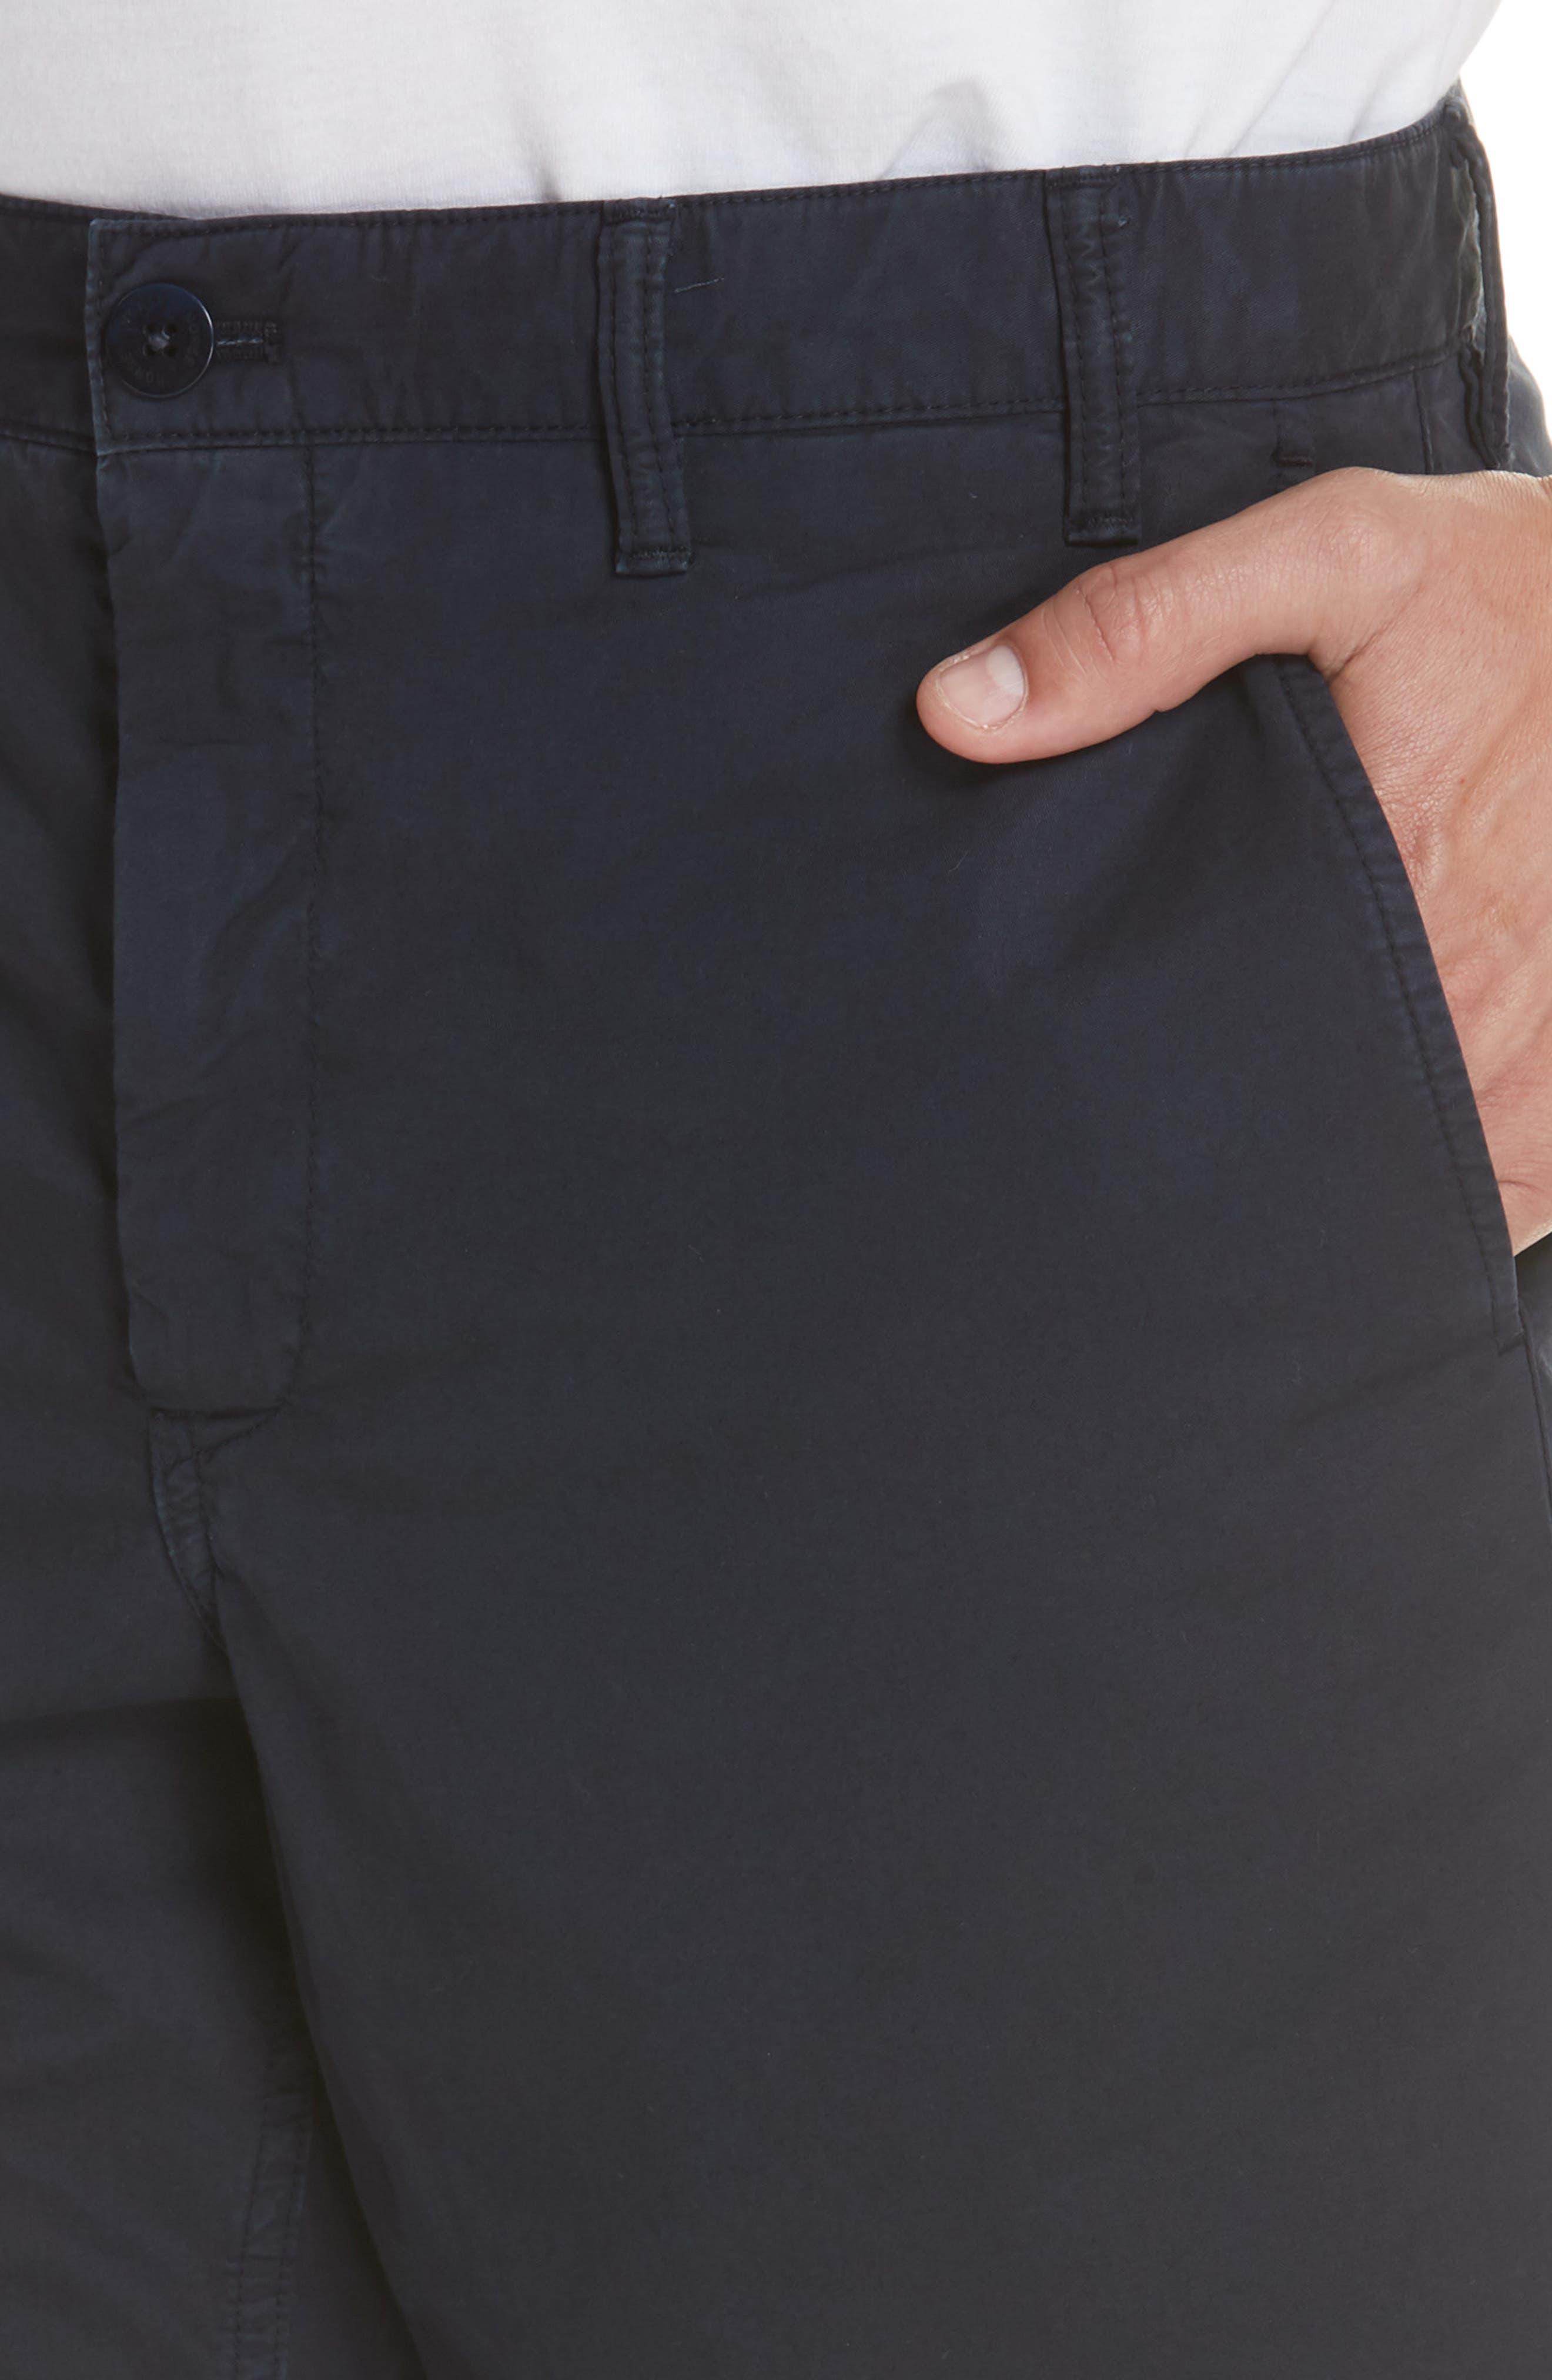 Aros Twill Shorts,                             Alternate thumbnail 4, color,                             DARK NAVY